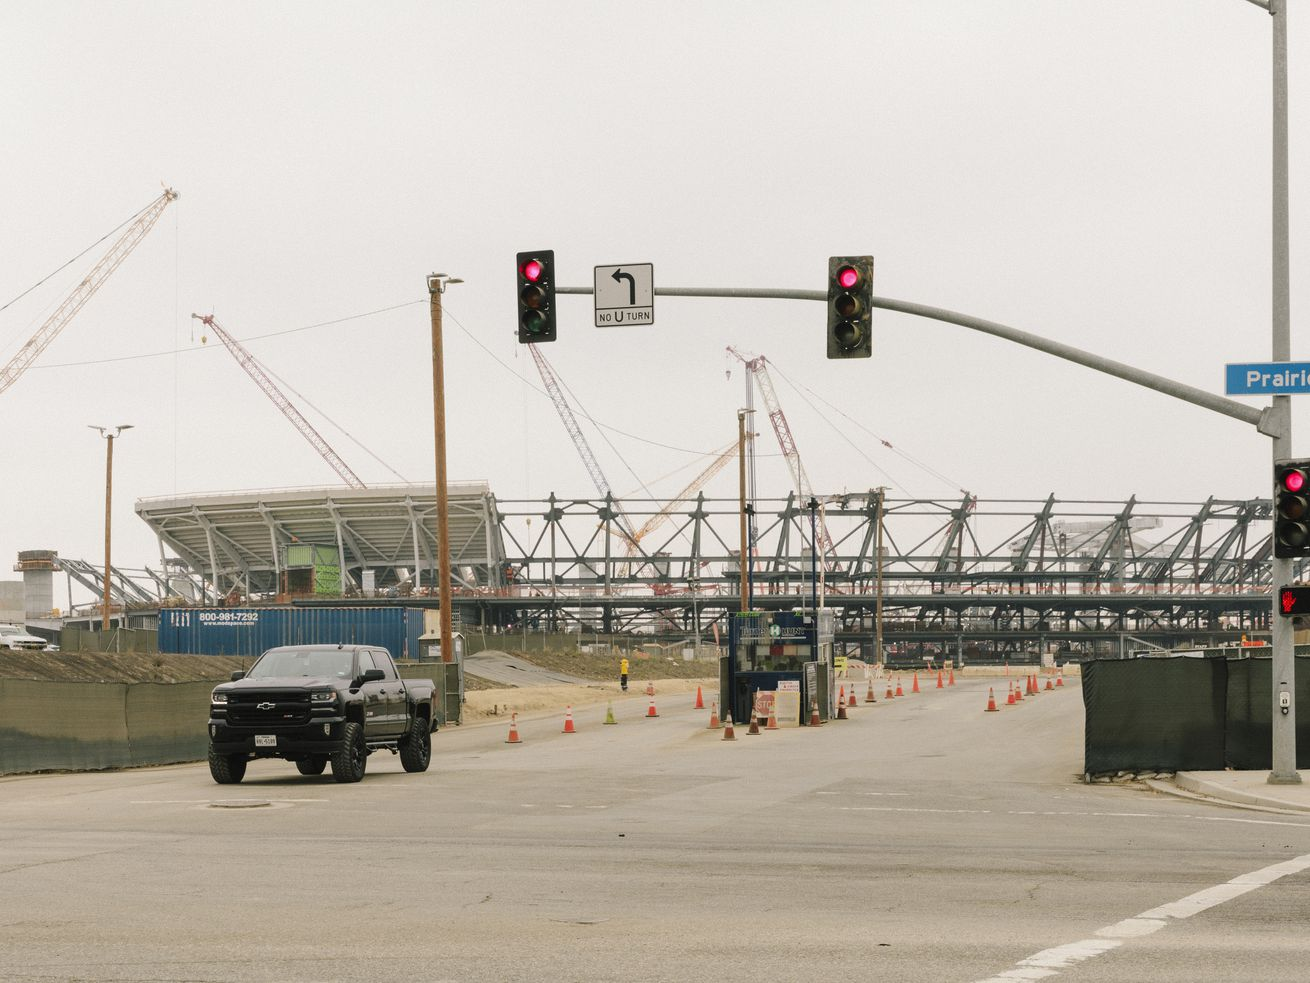 The NFL stadium under construction in Inglewood.